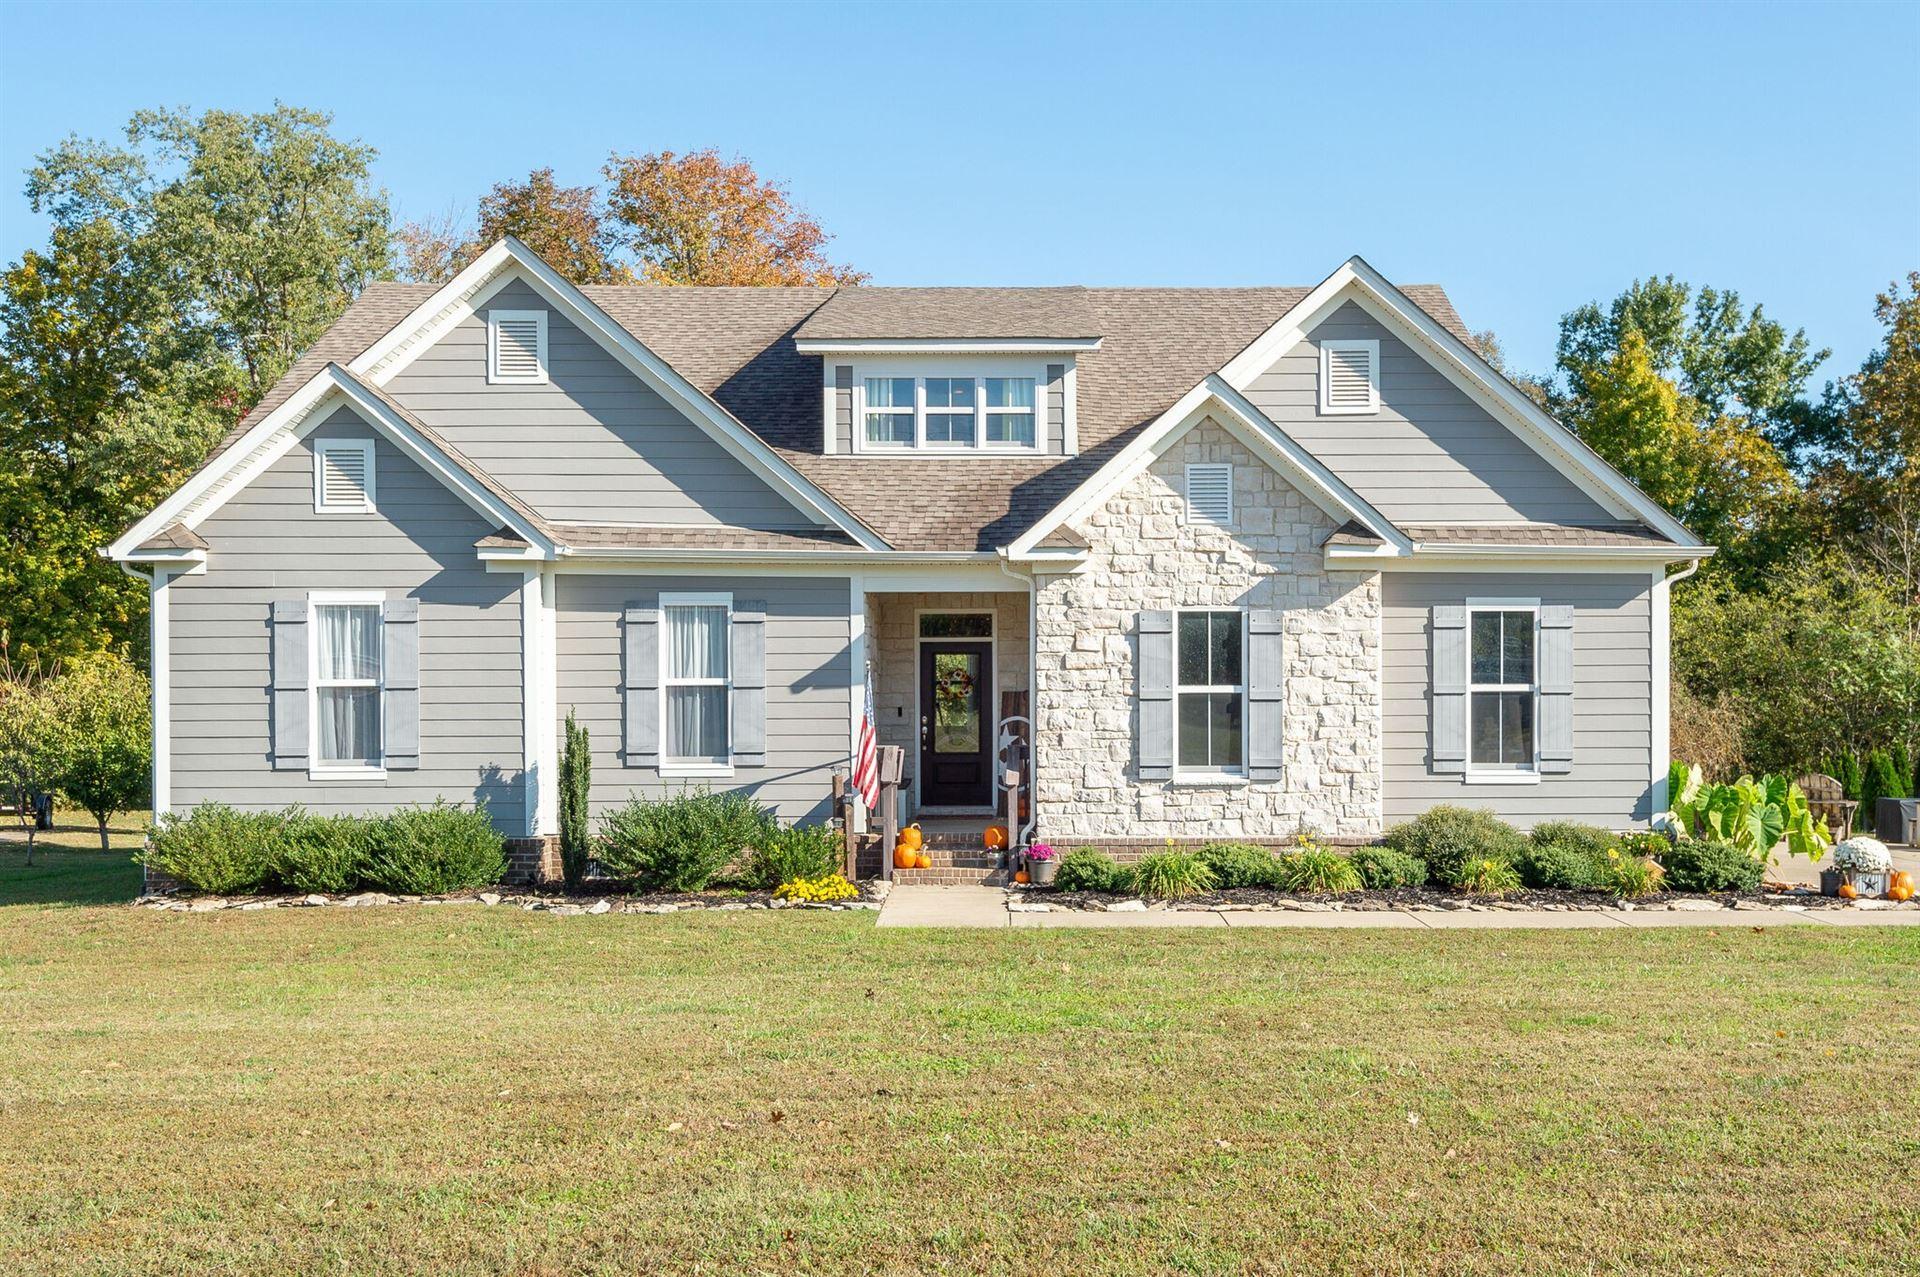 Photo of 1713 Zevon Ct, Spring Hill, TN 37174 (MLS # 2199202)